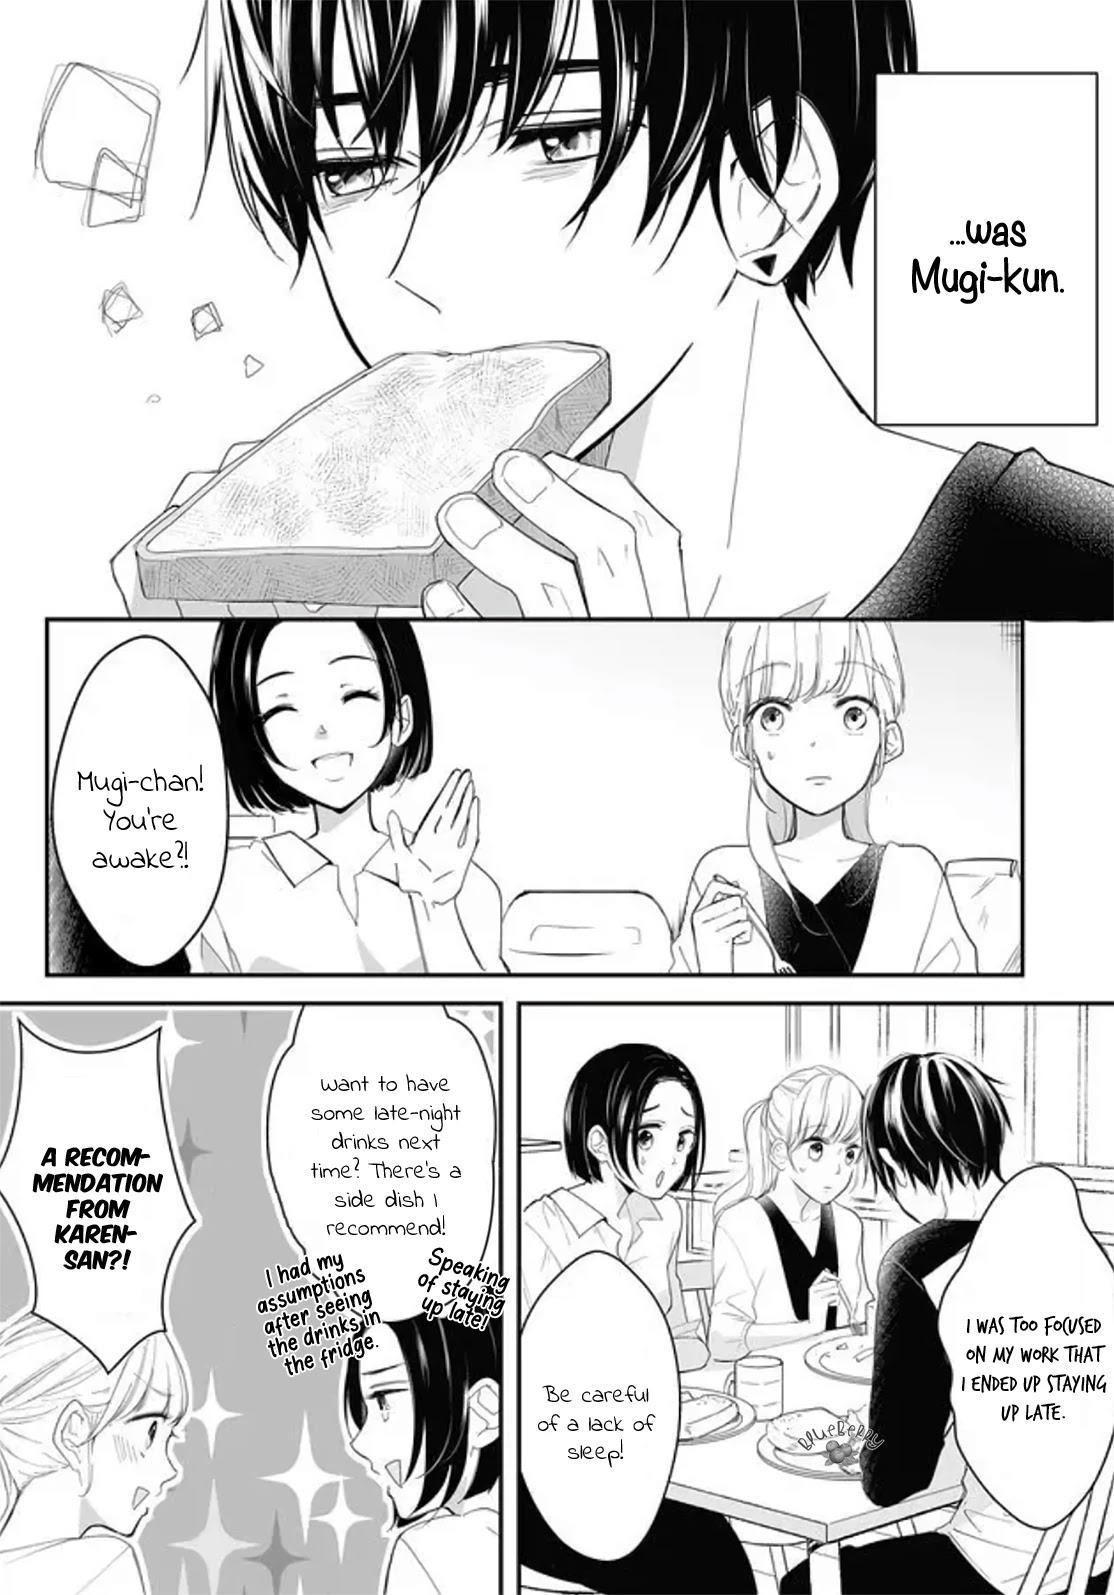 Mugi-Kun Ni Koi Wo Shite Wa Ikenai Chapter 5 page 5 - Mangakakalots.com